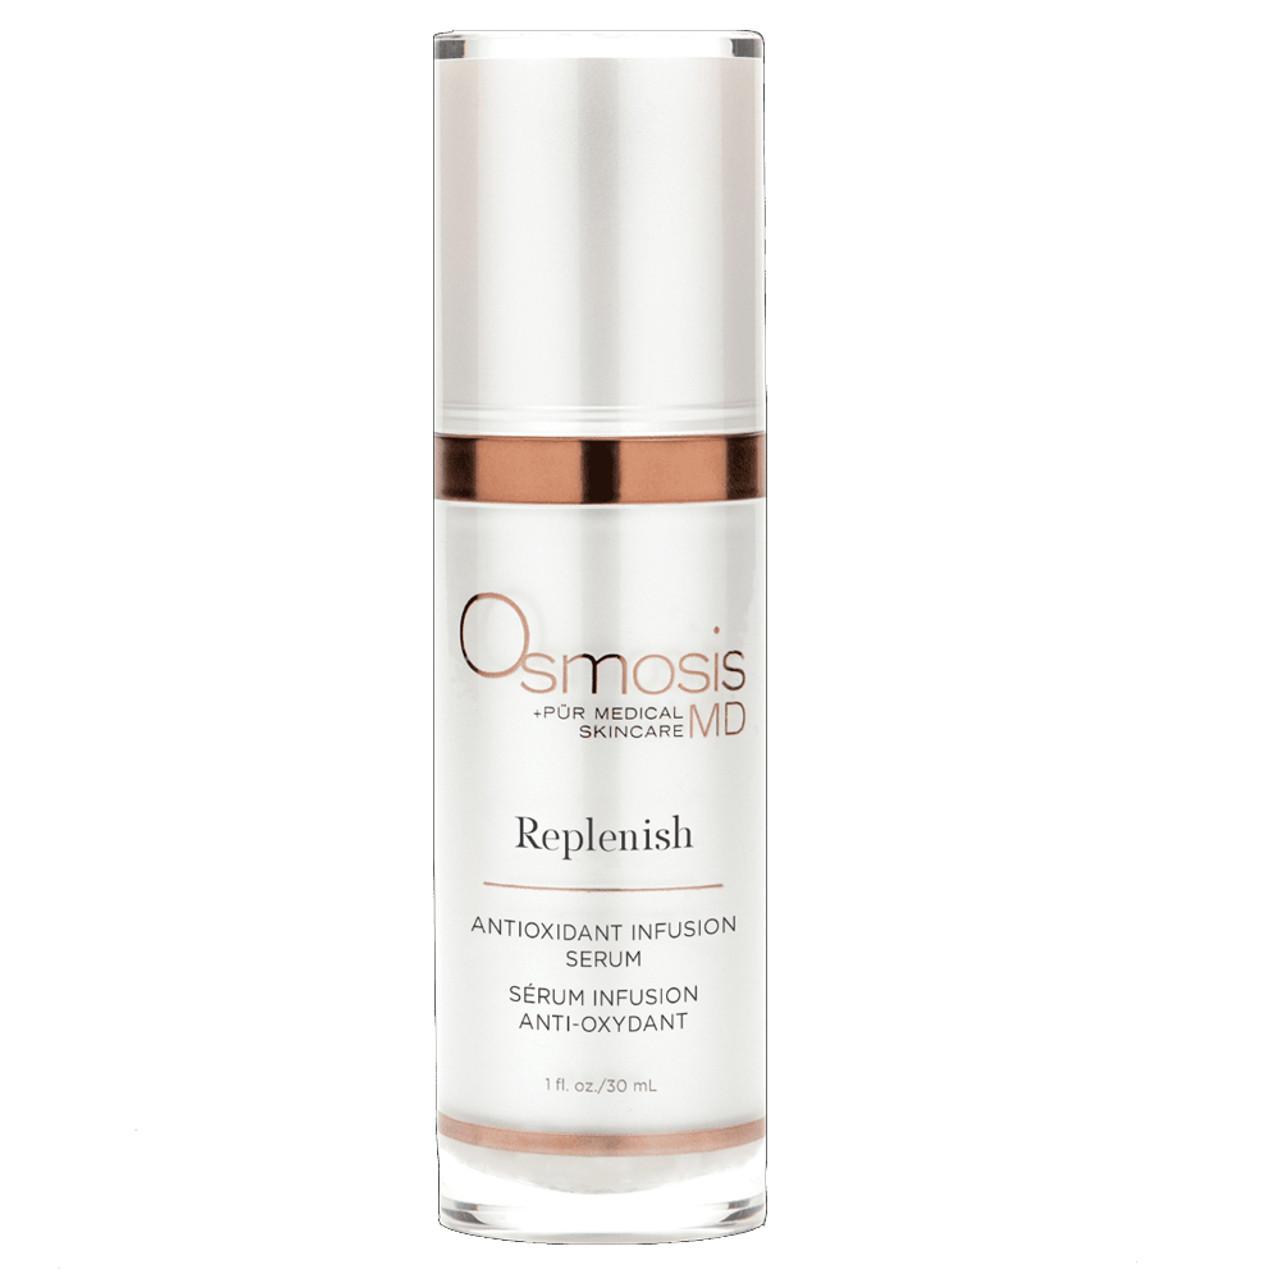 Osmosis +Skincare MD Replenish - Antioxidant Infusion Serum